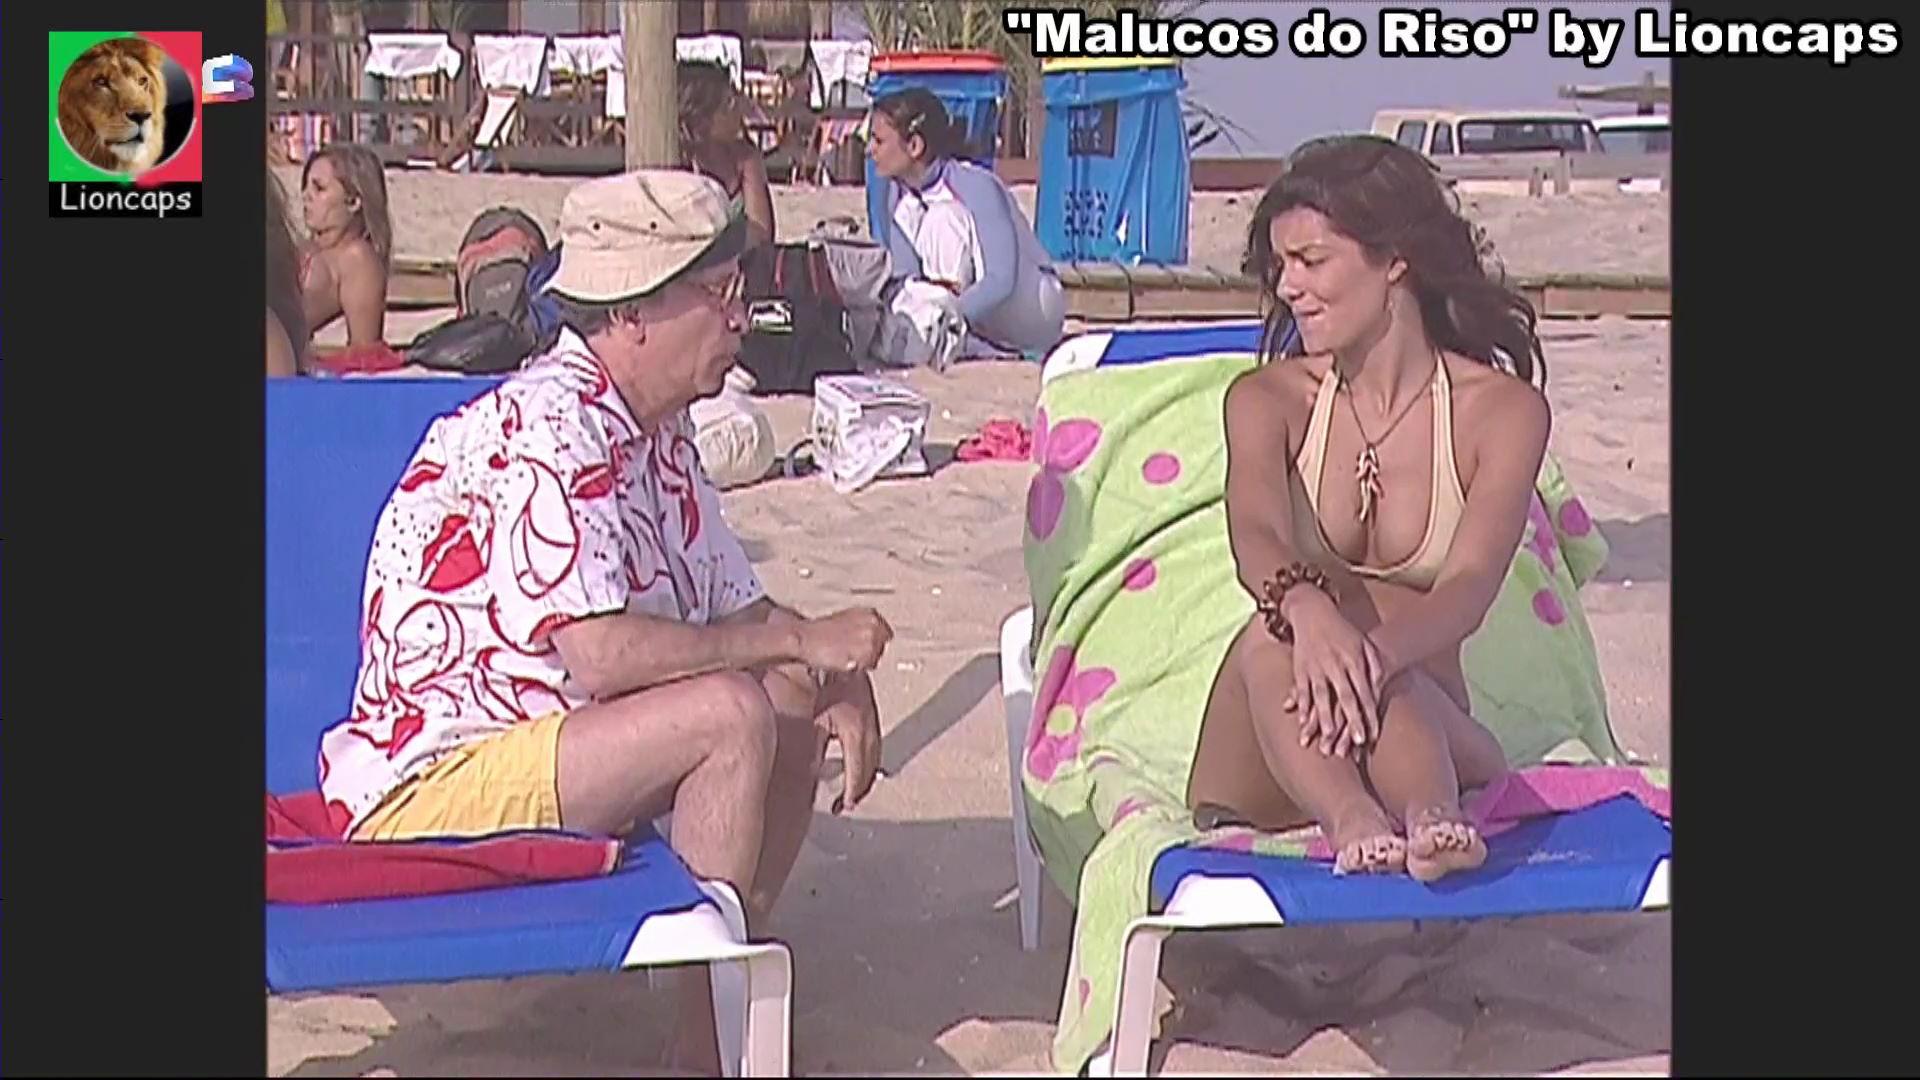 475063710_malucos_riso_alda_gomes_vs190malucos_riso_602_1508_122_443lo.JPG